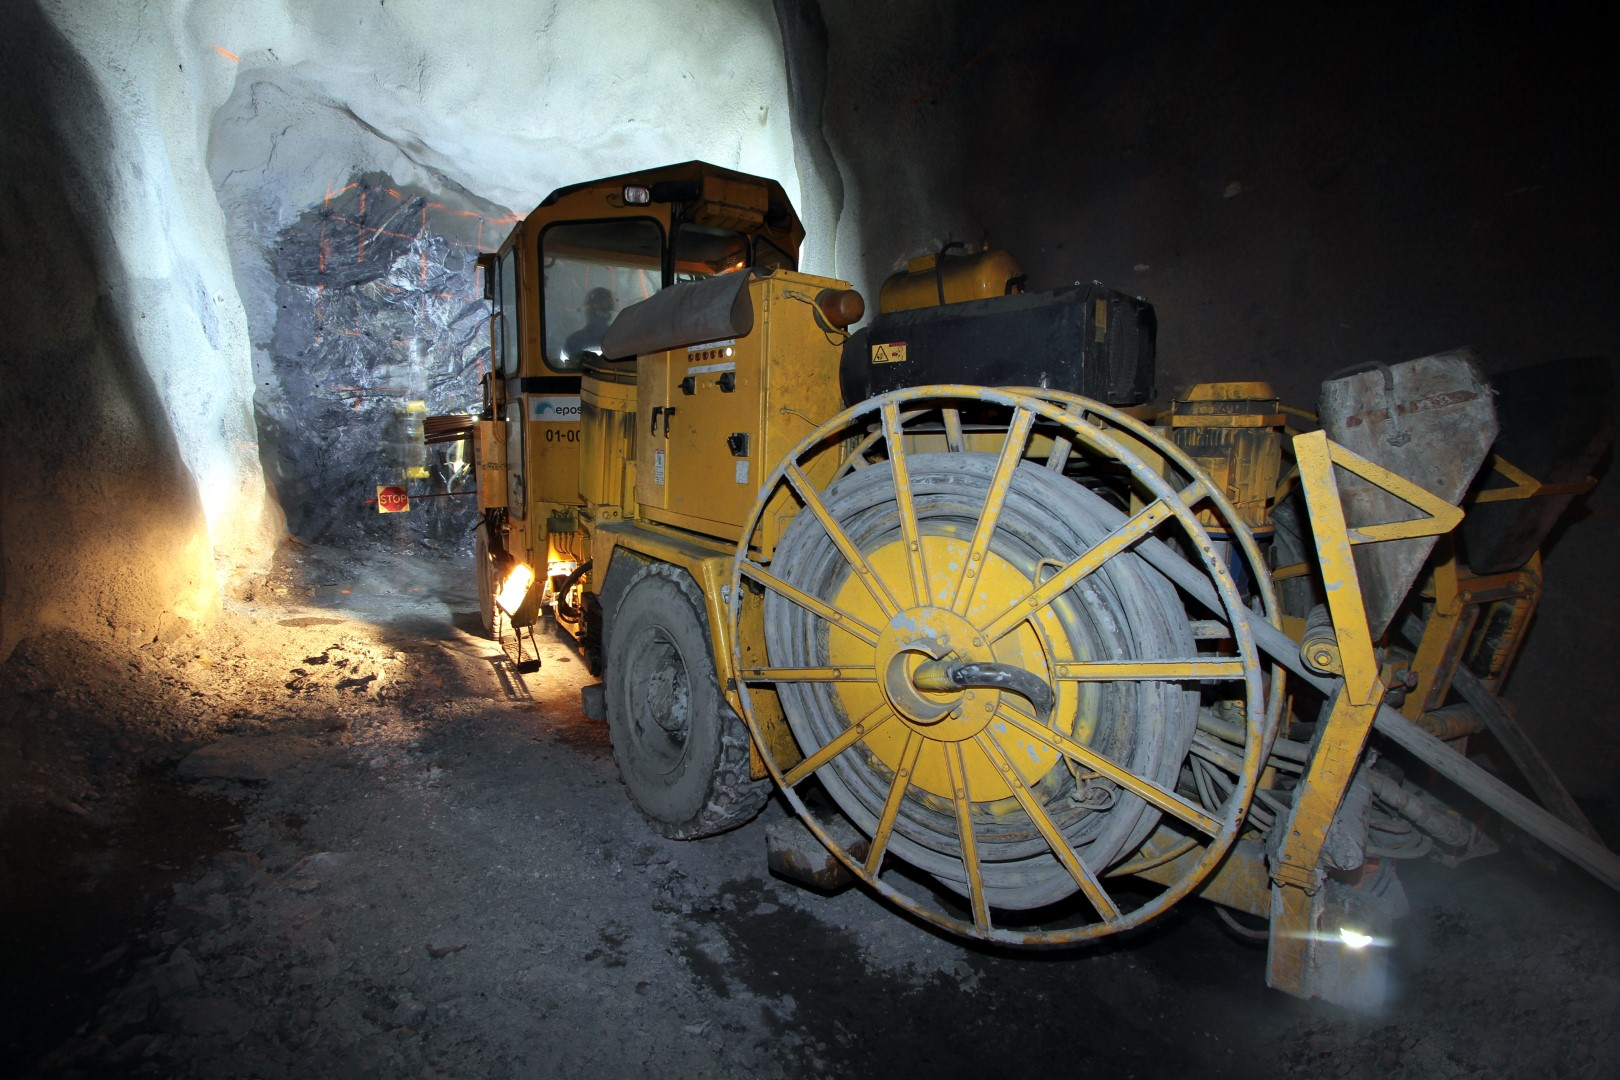 mina-de-neves-corvo-2021 (11)